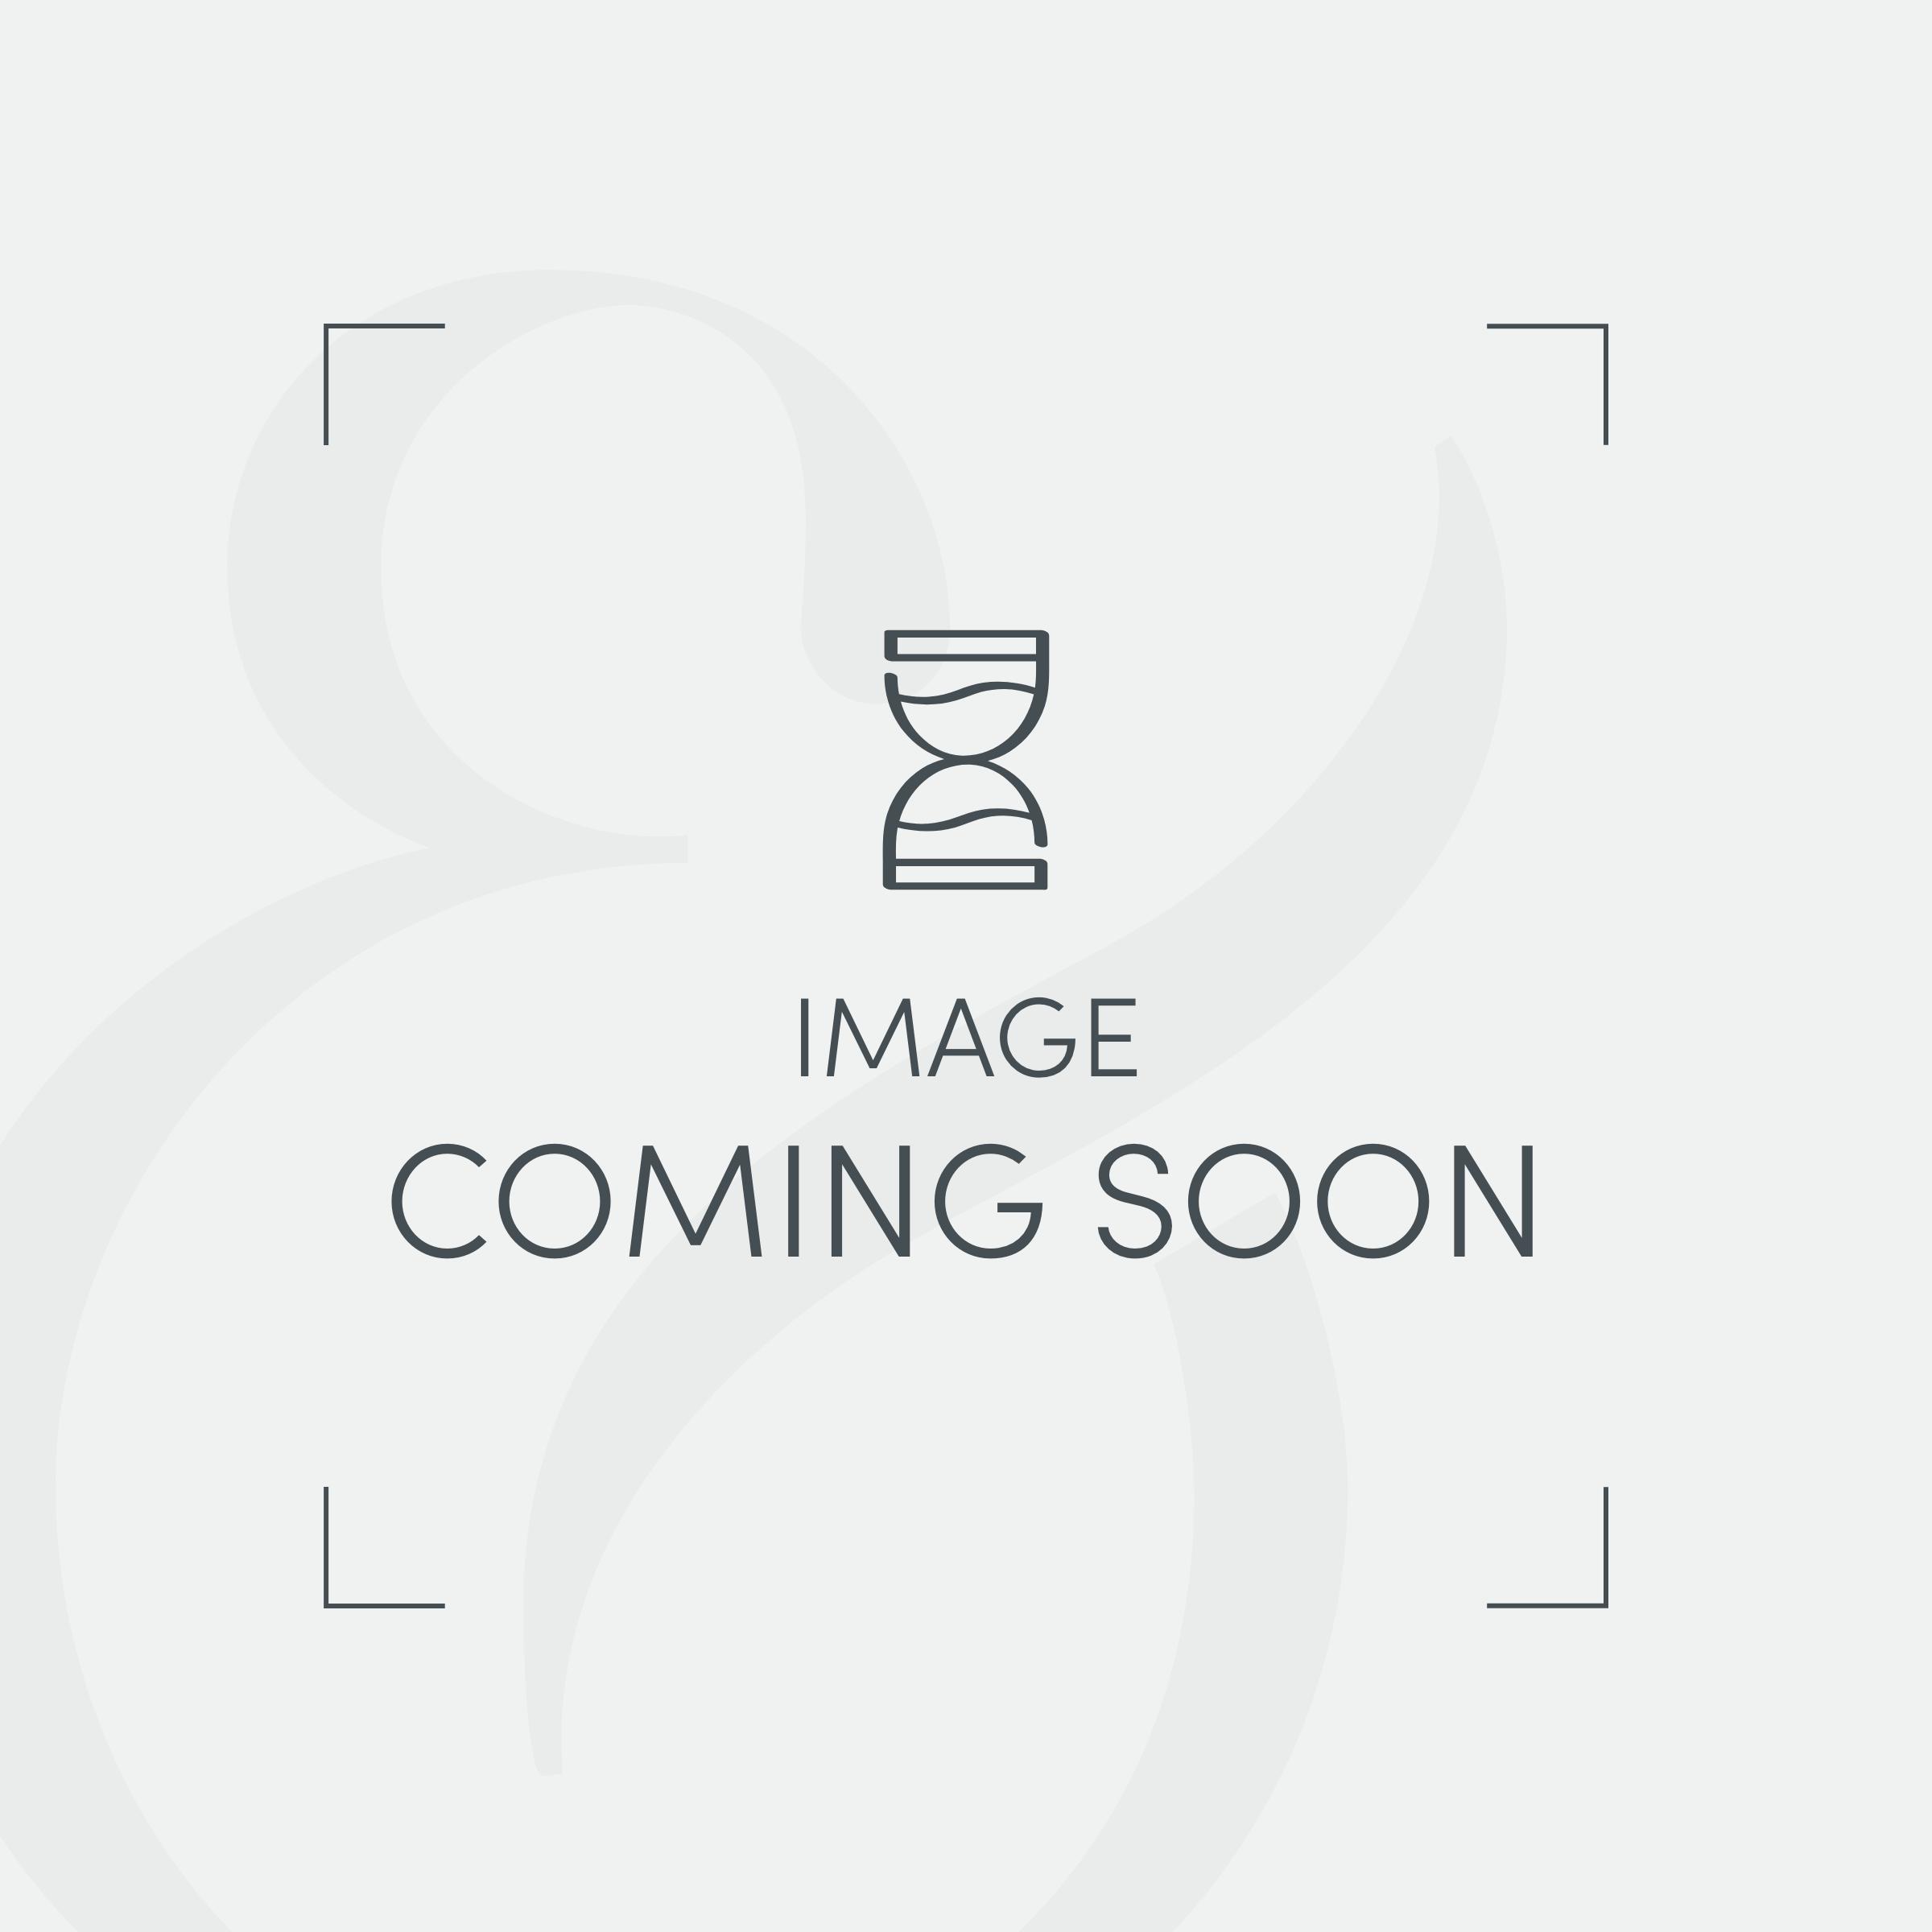 Luxury 600TC Egyptian Cotton Bed Set - Dark Grey - Single (Duvet Cover, Standard Oxford Pillowcase Pair)